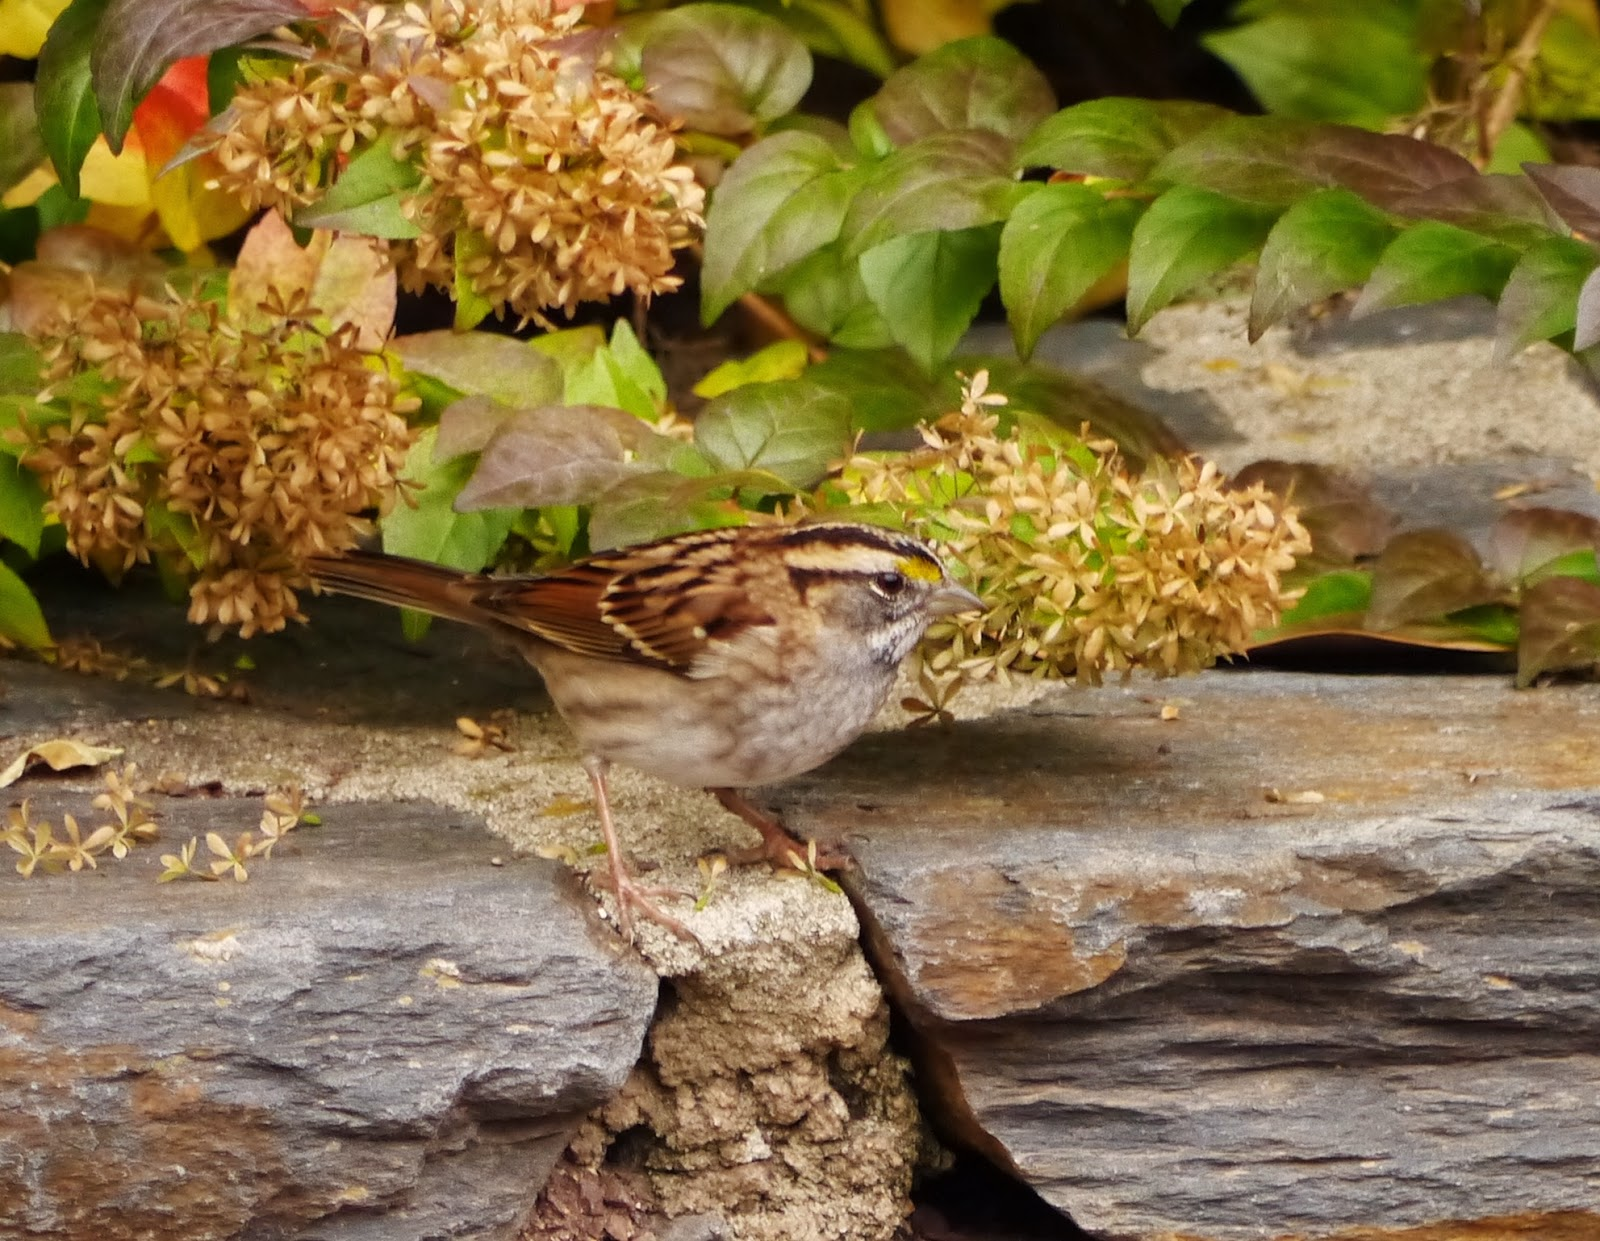 The wildlife garden in the h l blomquist garden of native plants - White Throated Sparrow